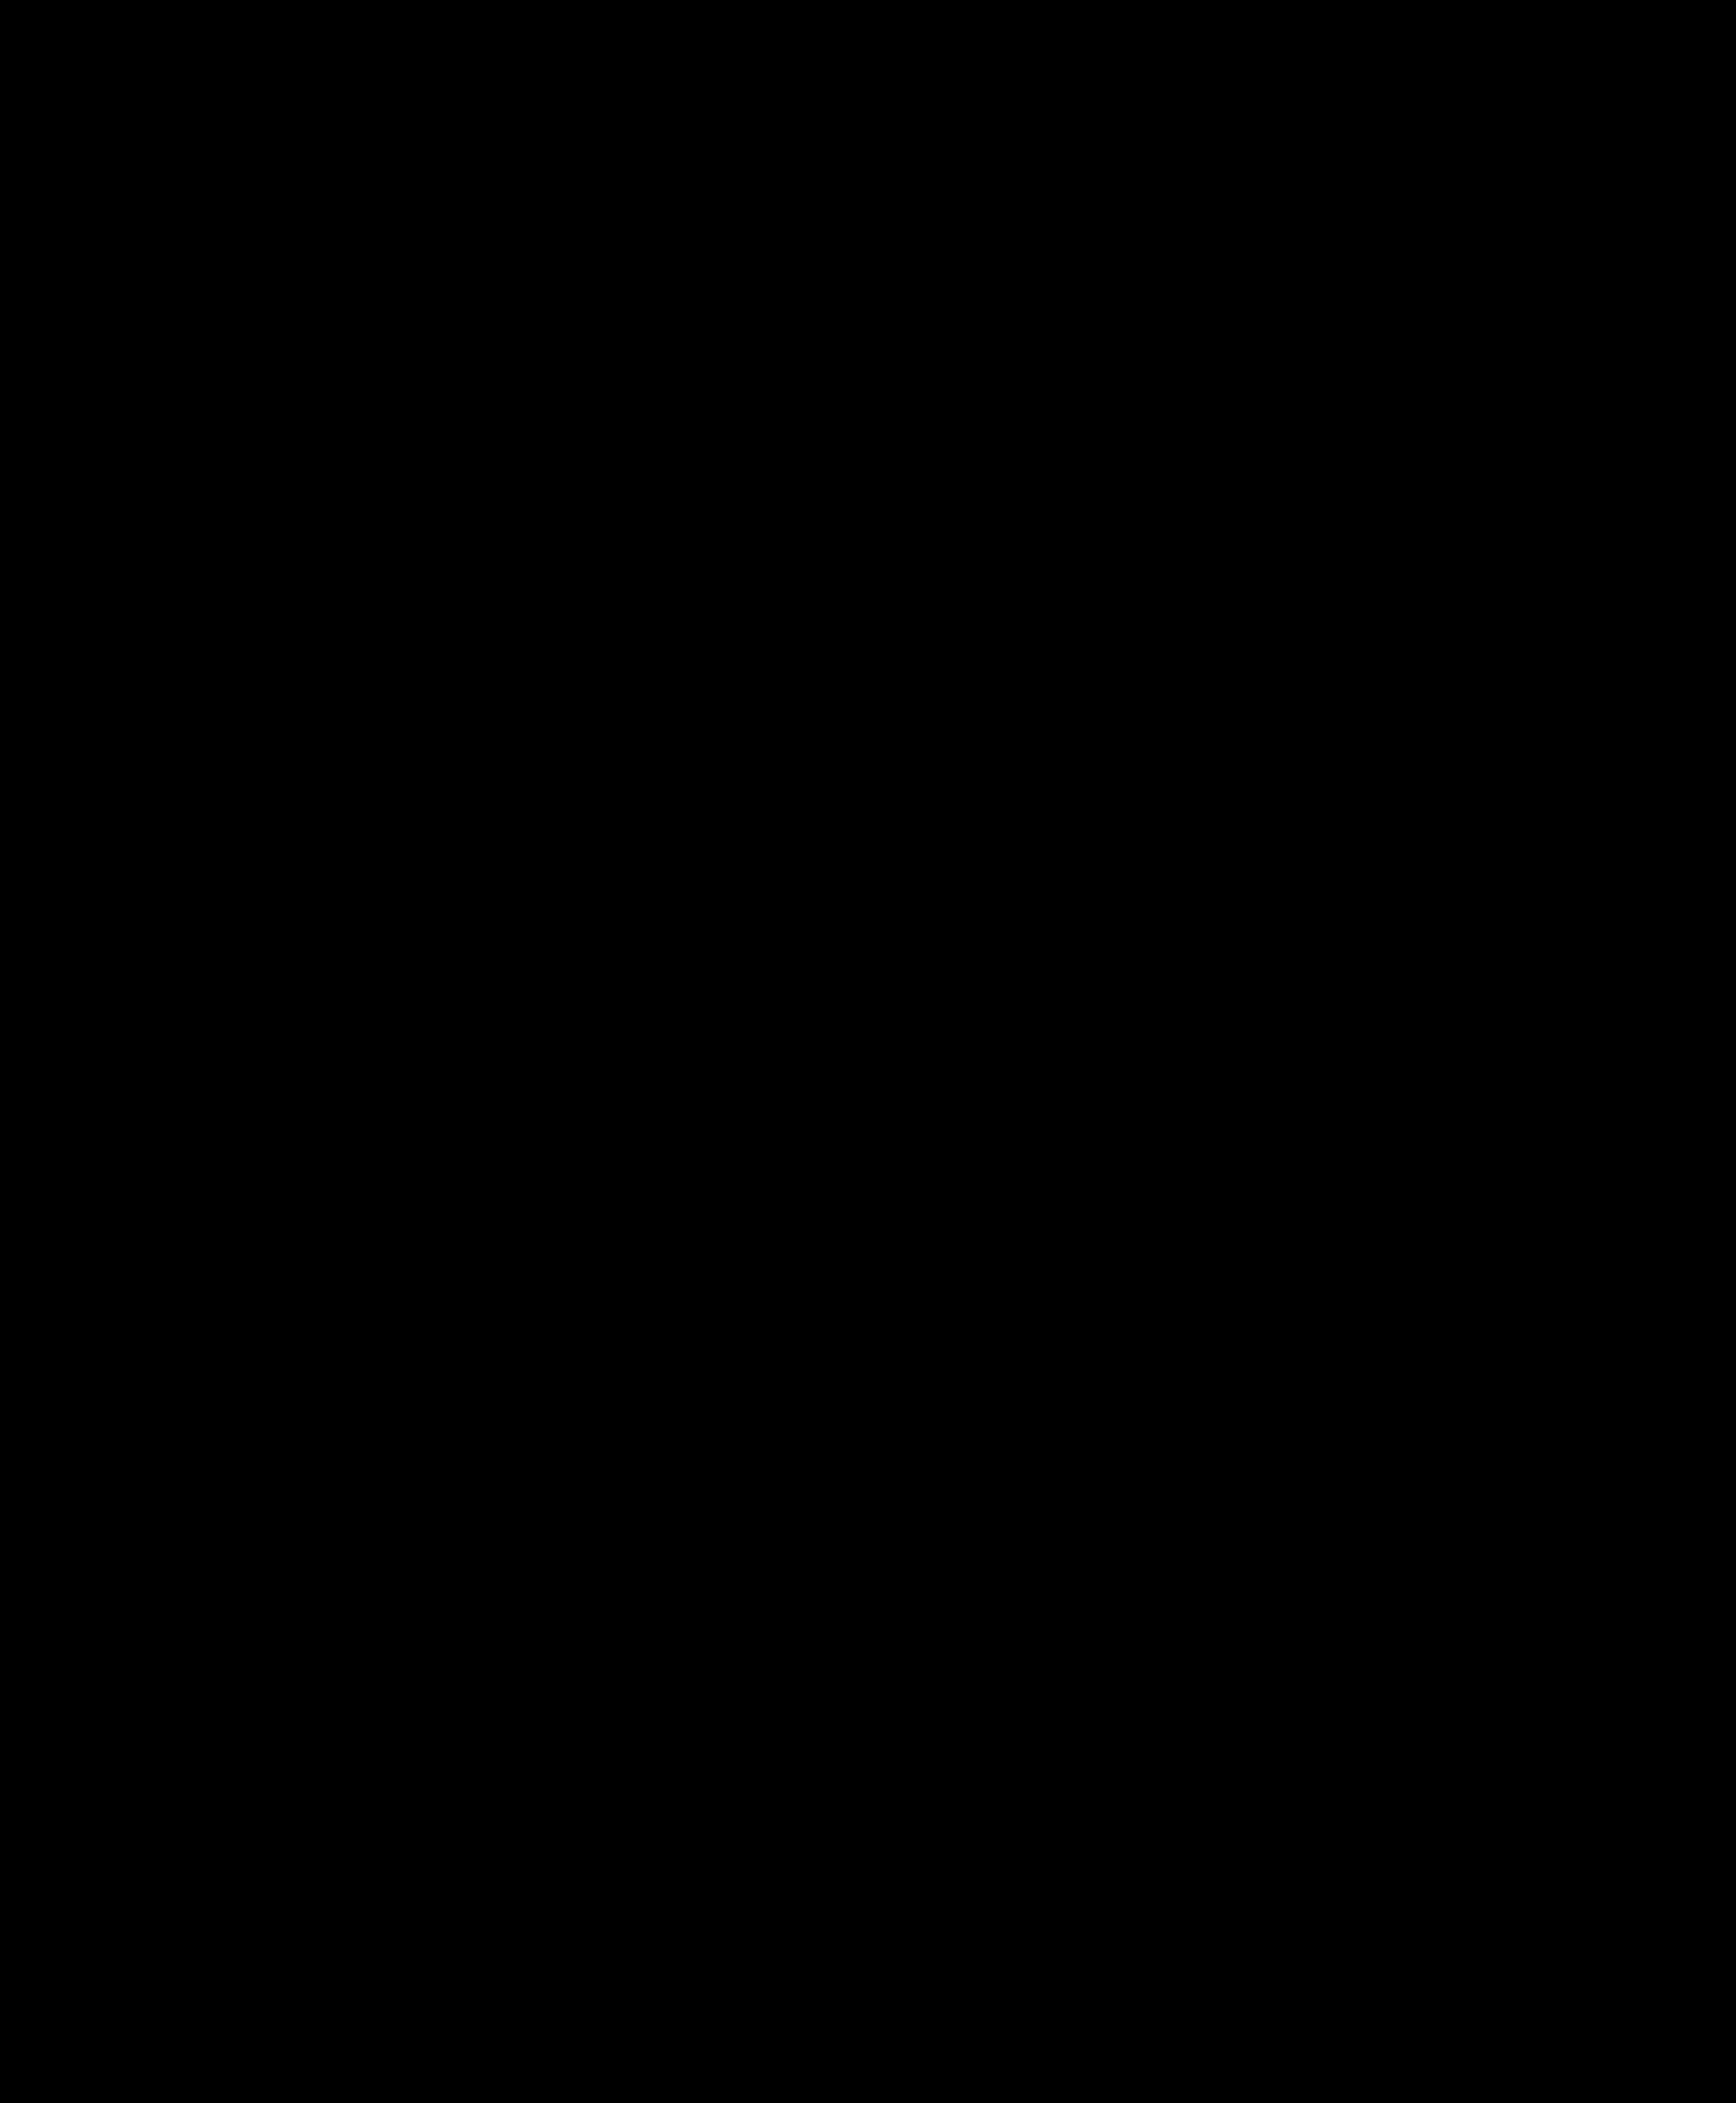 Virgo symbol 7